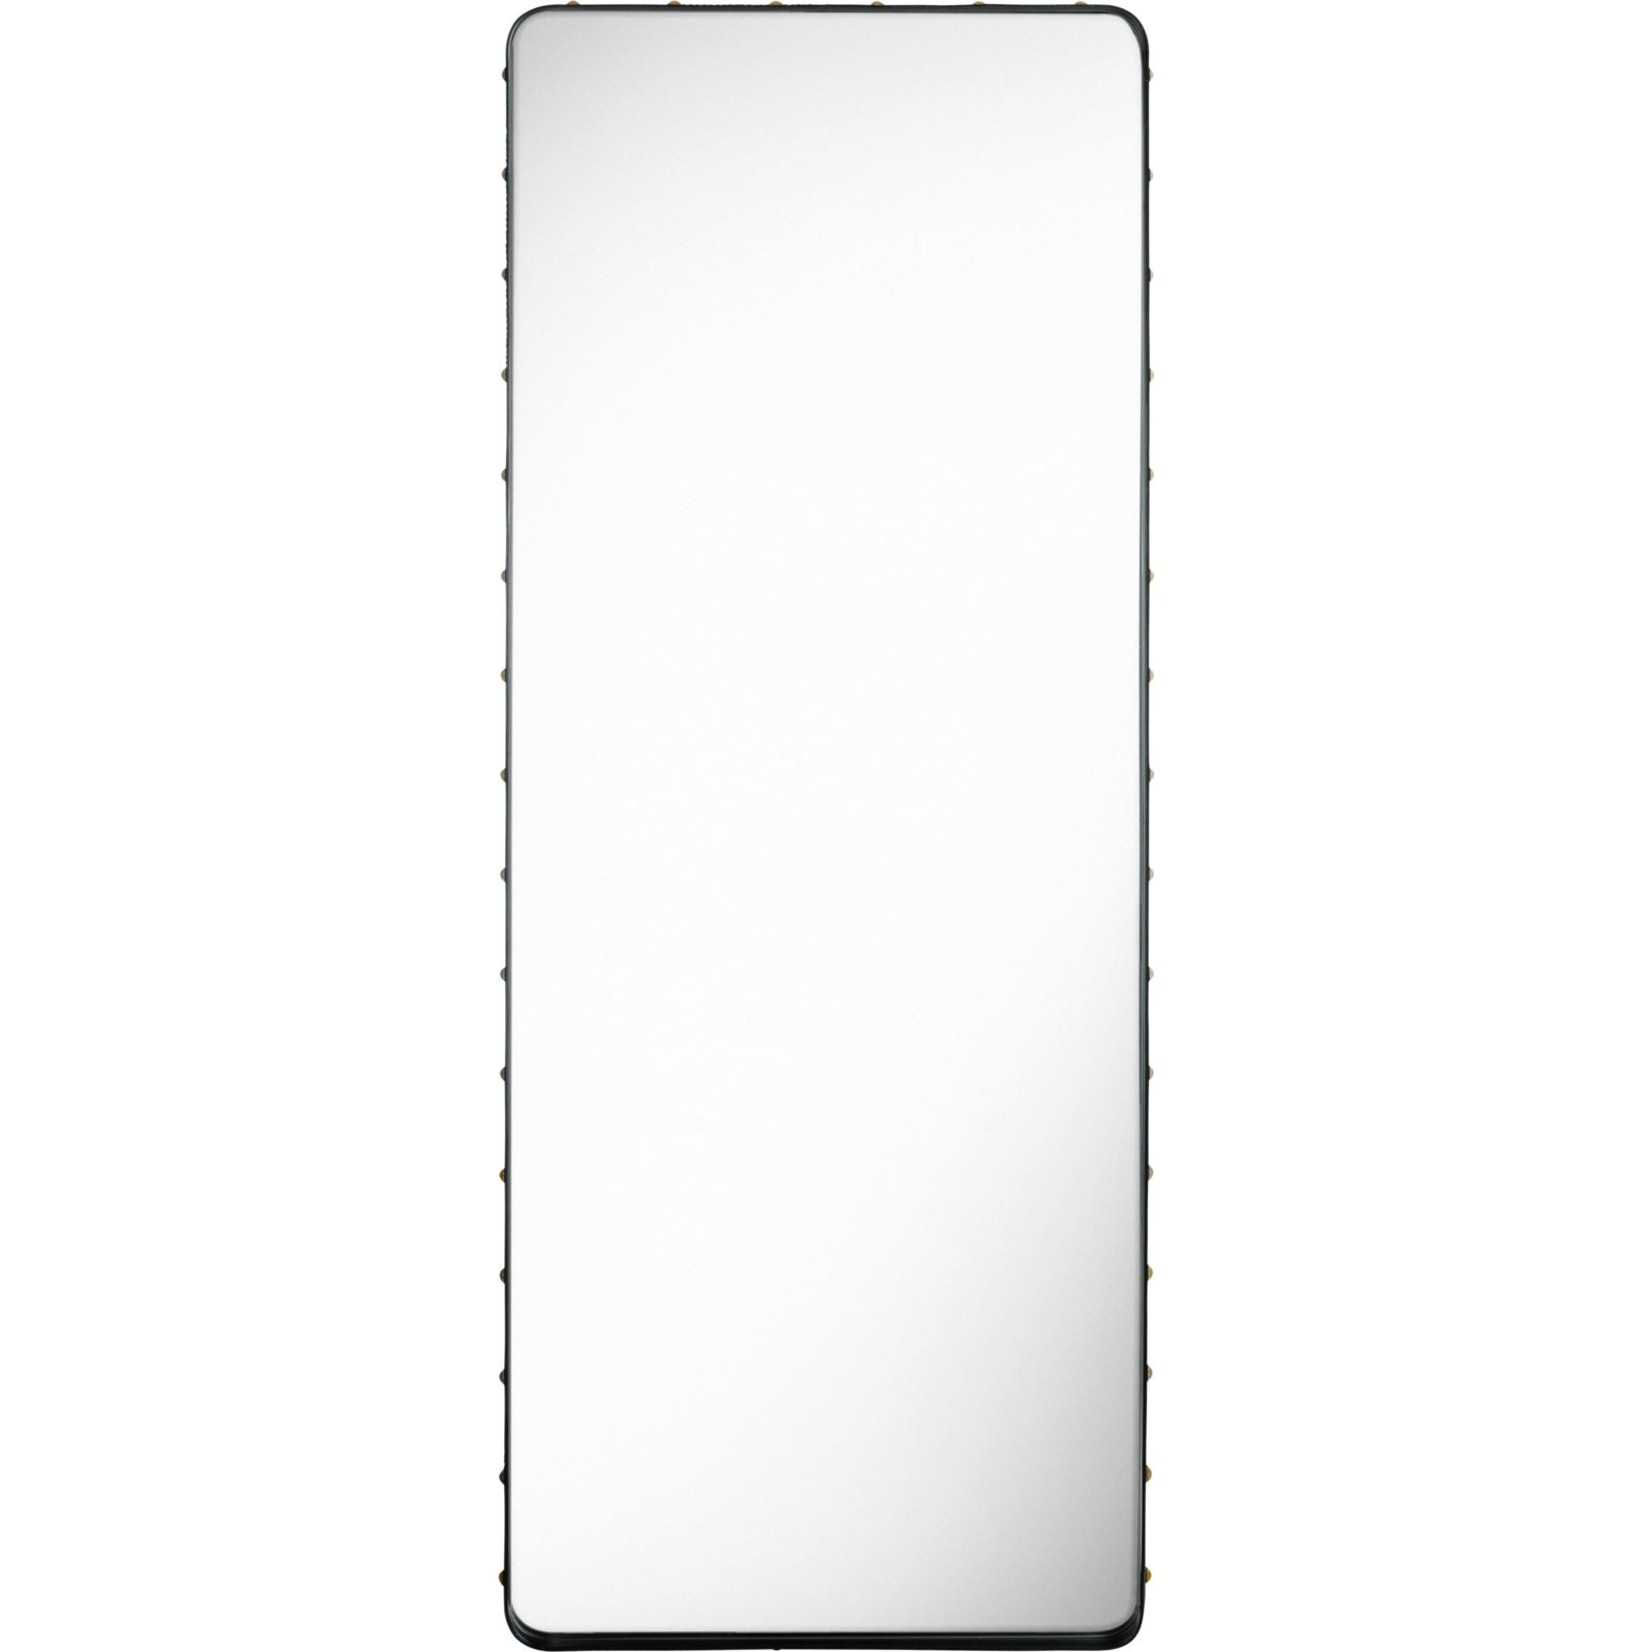 Gubi Wall mirror Adnet - Rectangular - 70x180 - Black Leather